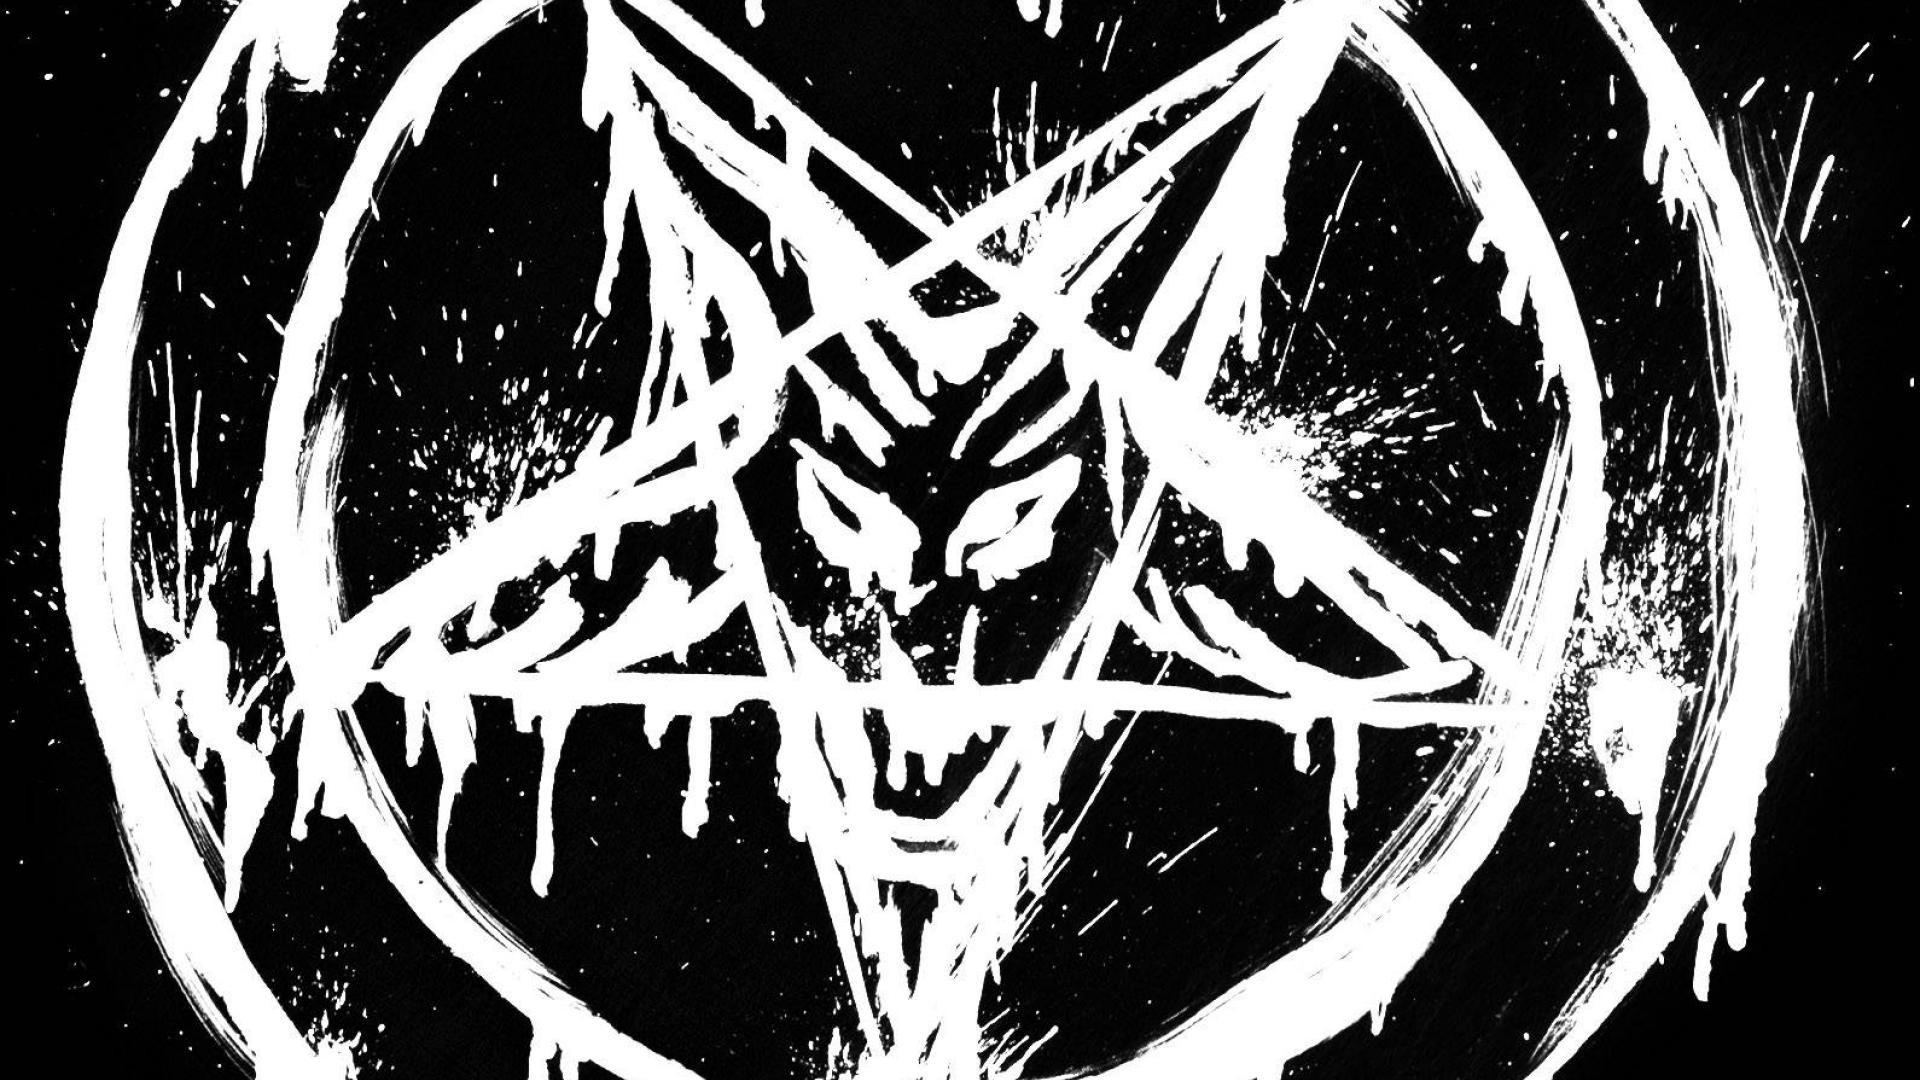 2000x2000 Satanic Wallpaper By Braintot